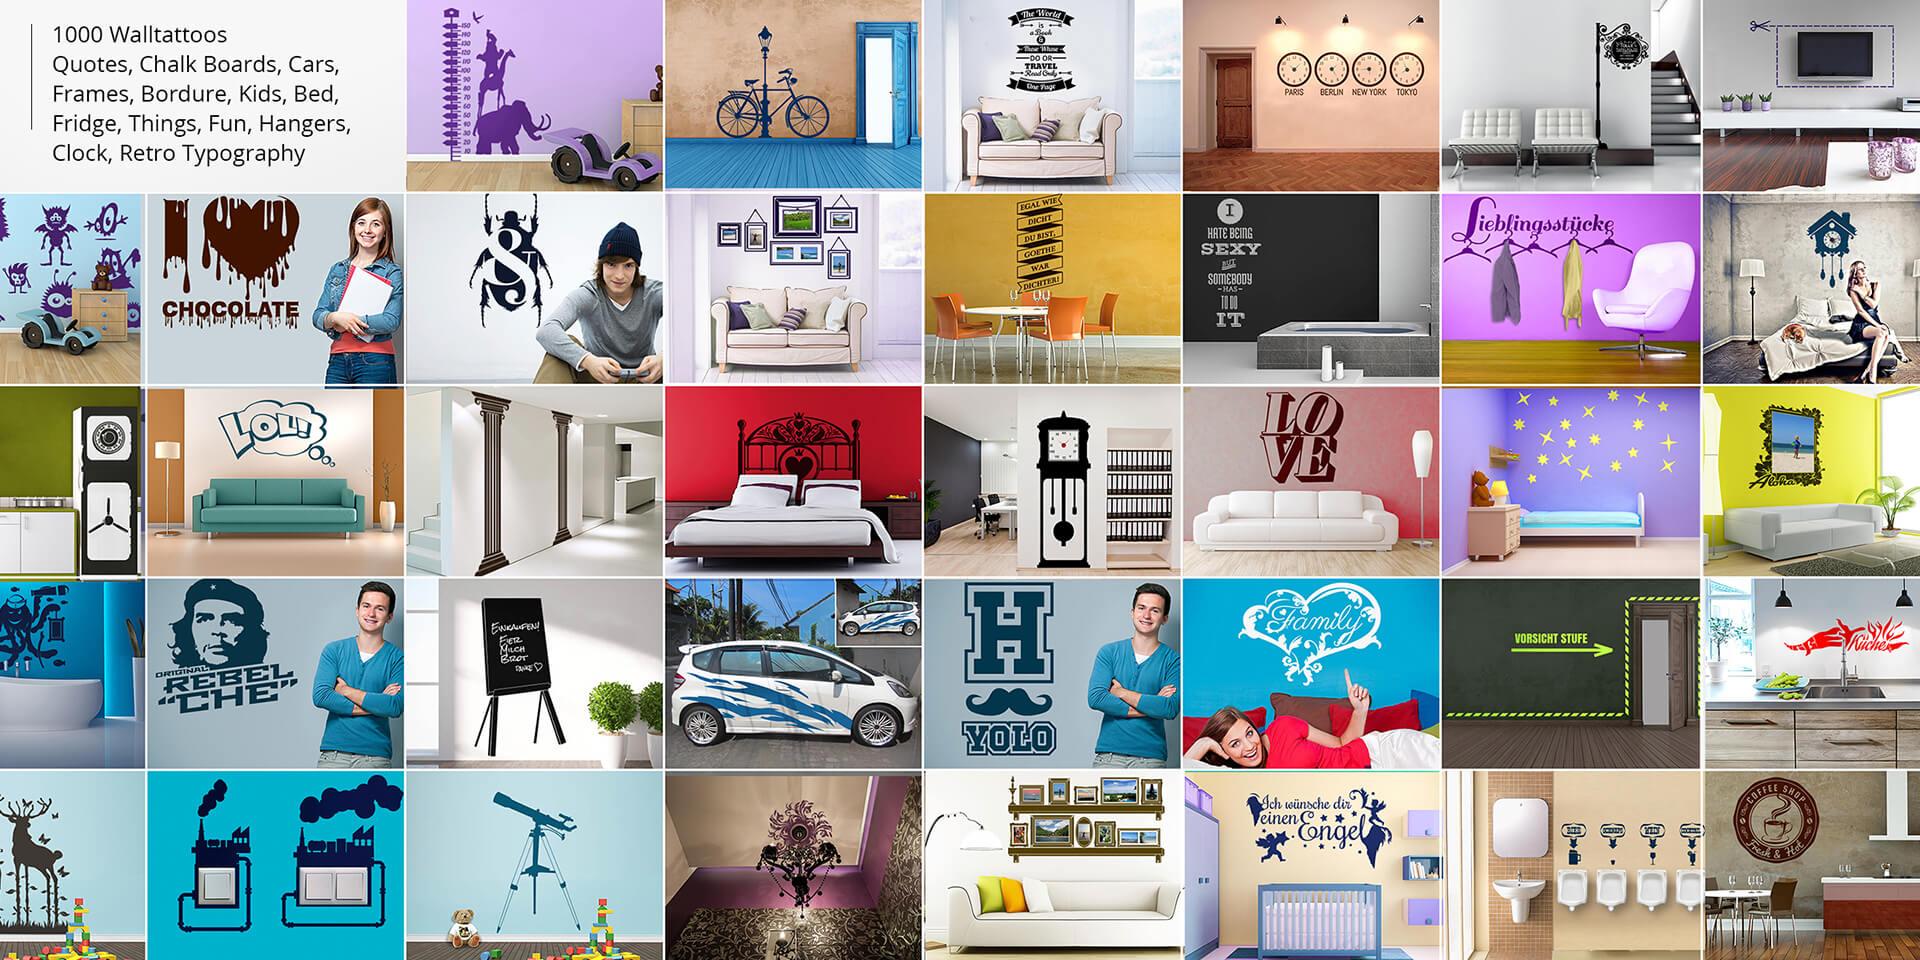 webdesign gfd presentation 2017 07 04 v3 posterjack 3